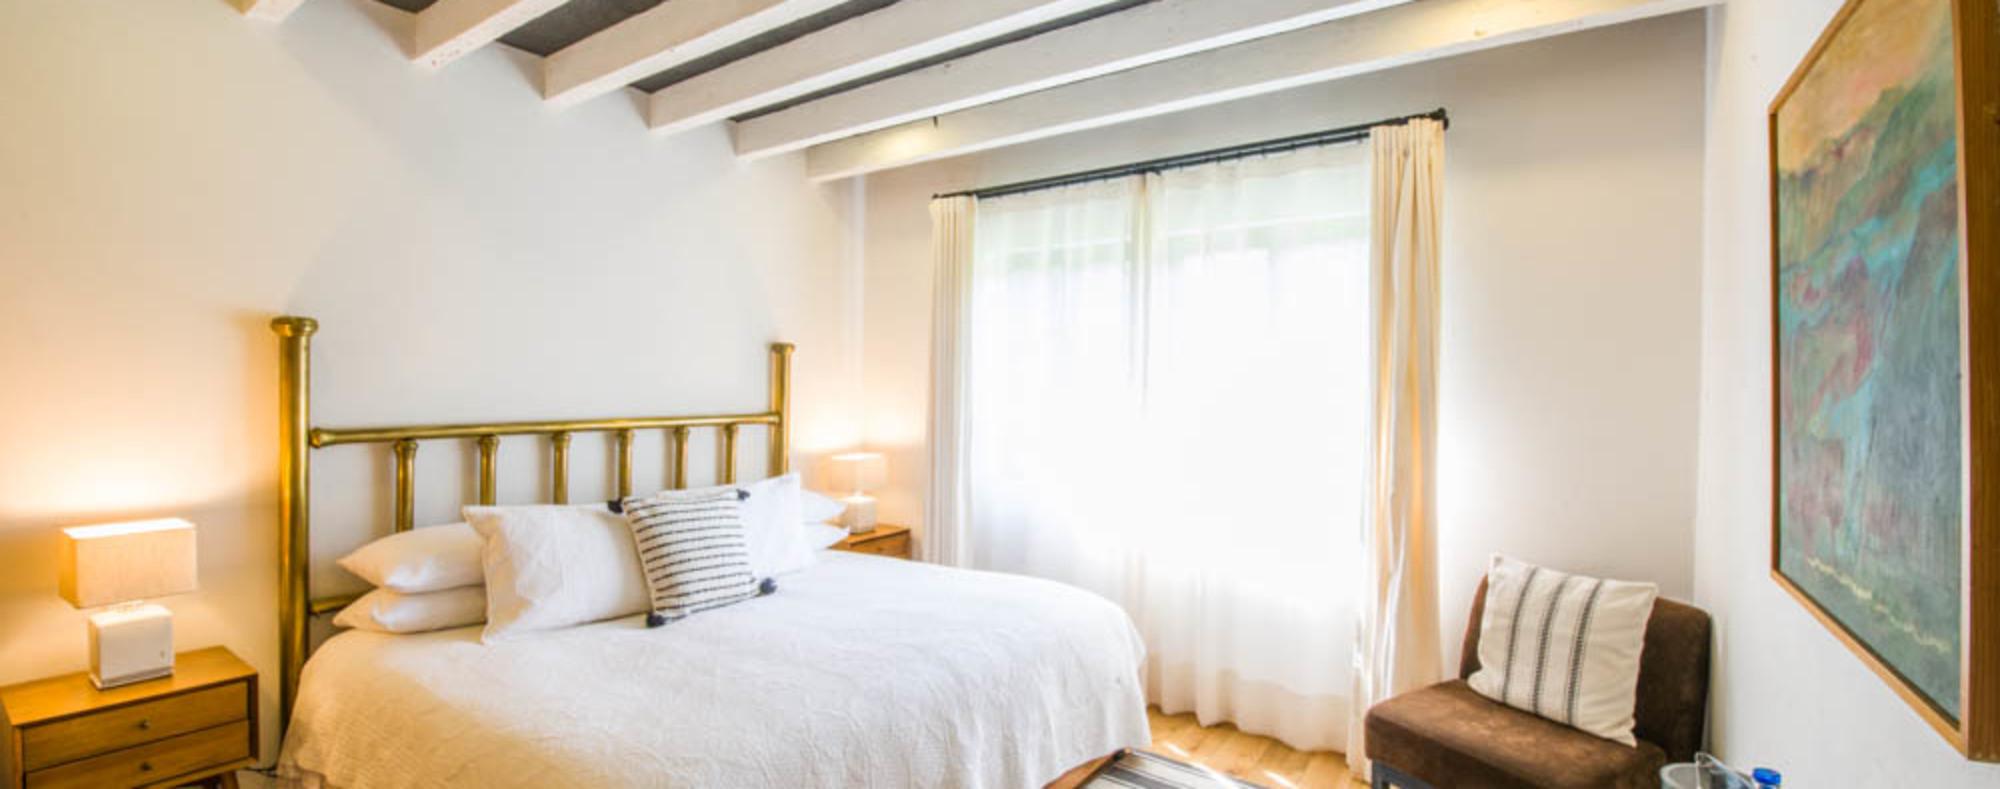 Villa Sol By Rodavento